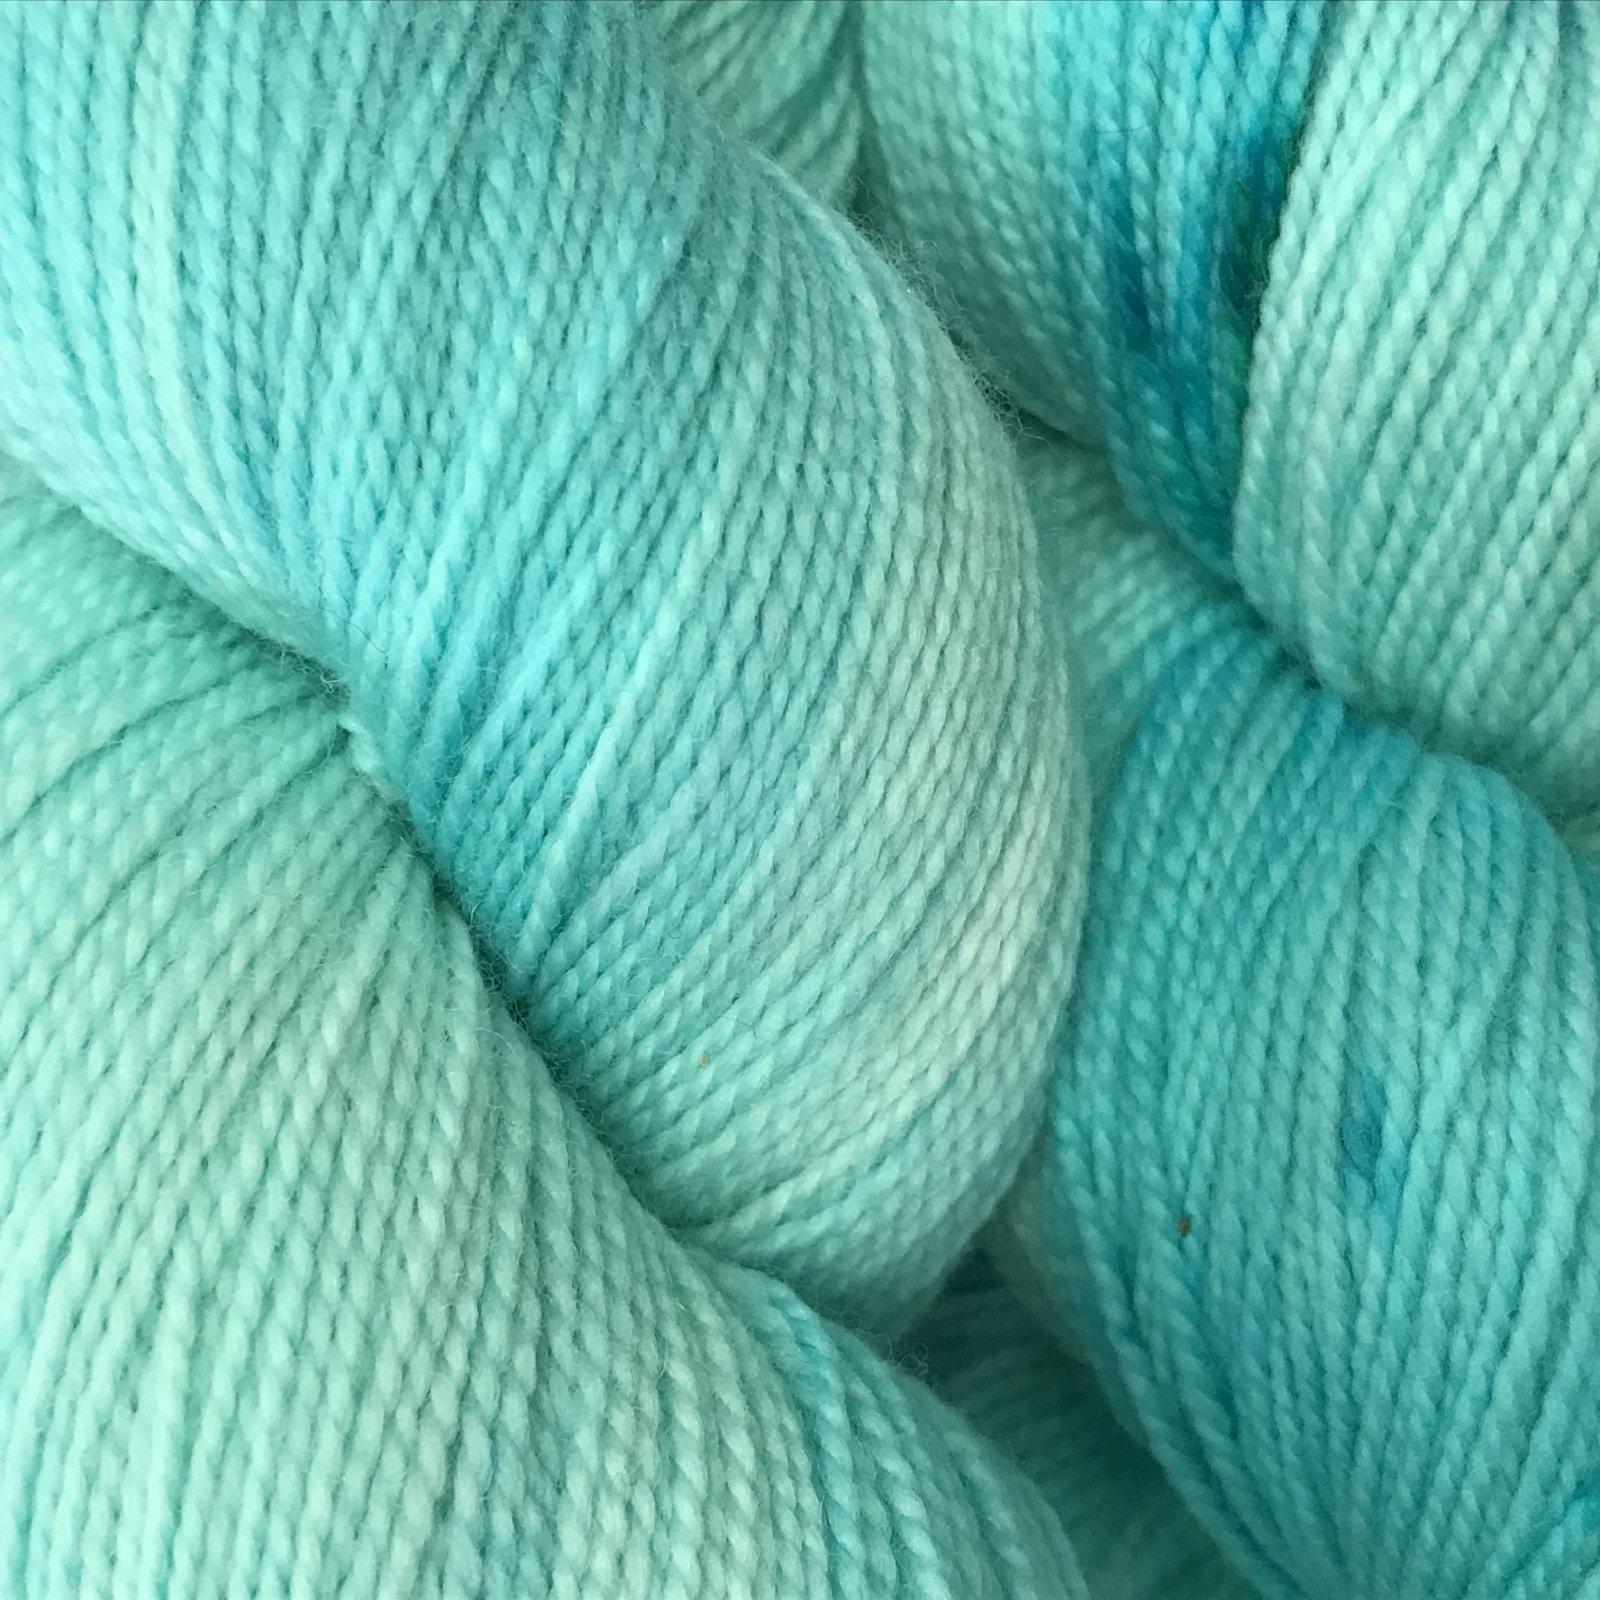 Stitch Together - Twisted Sock - Brain Freeze